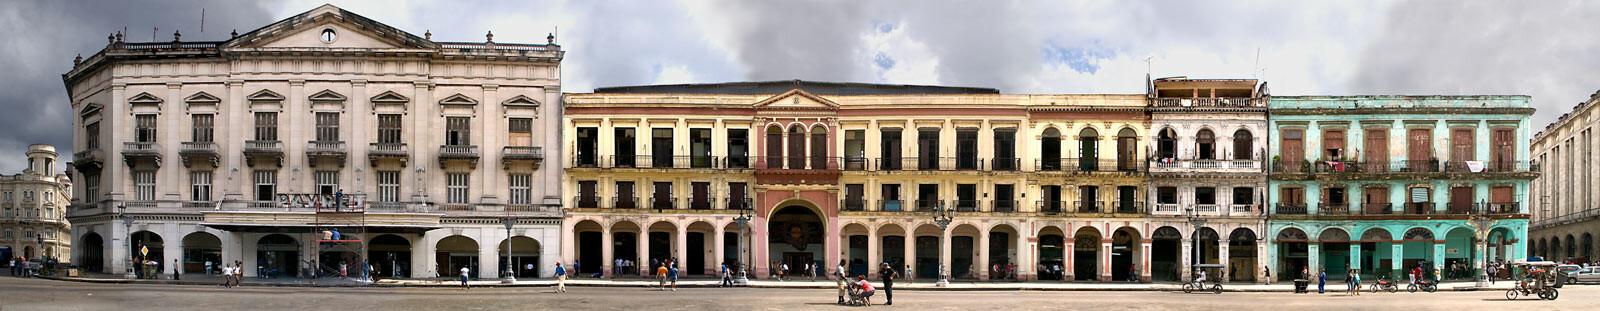 Havana, El Prado #5 - Larry Yust